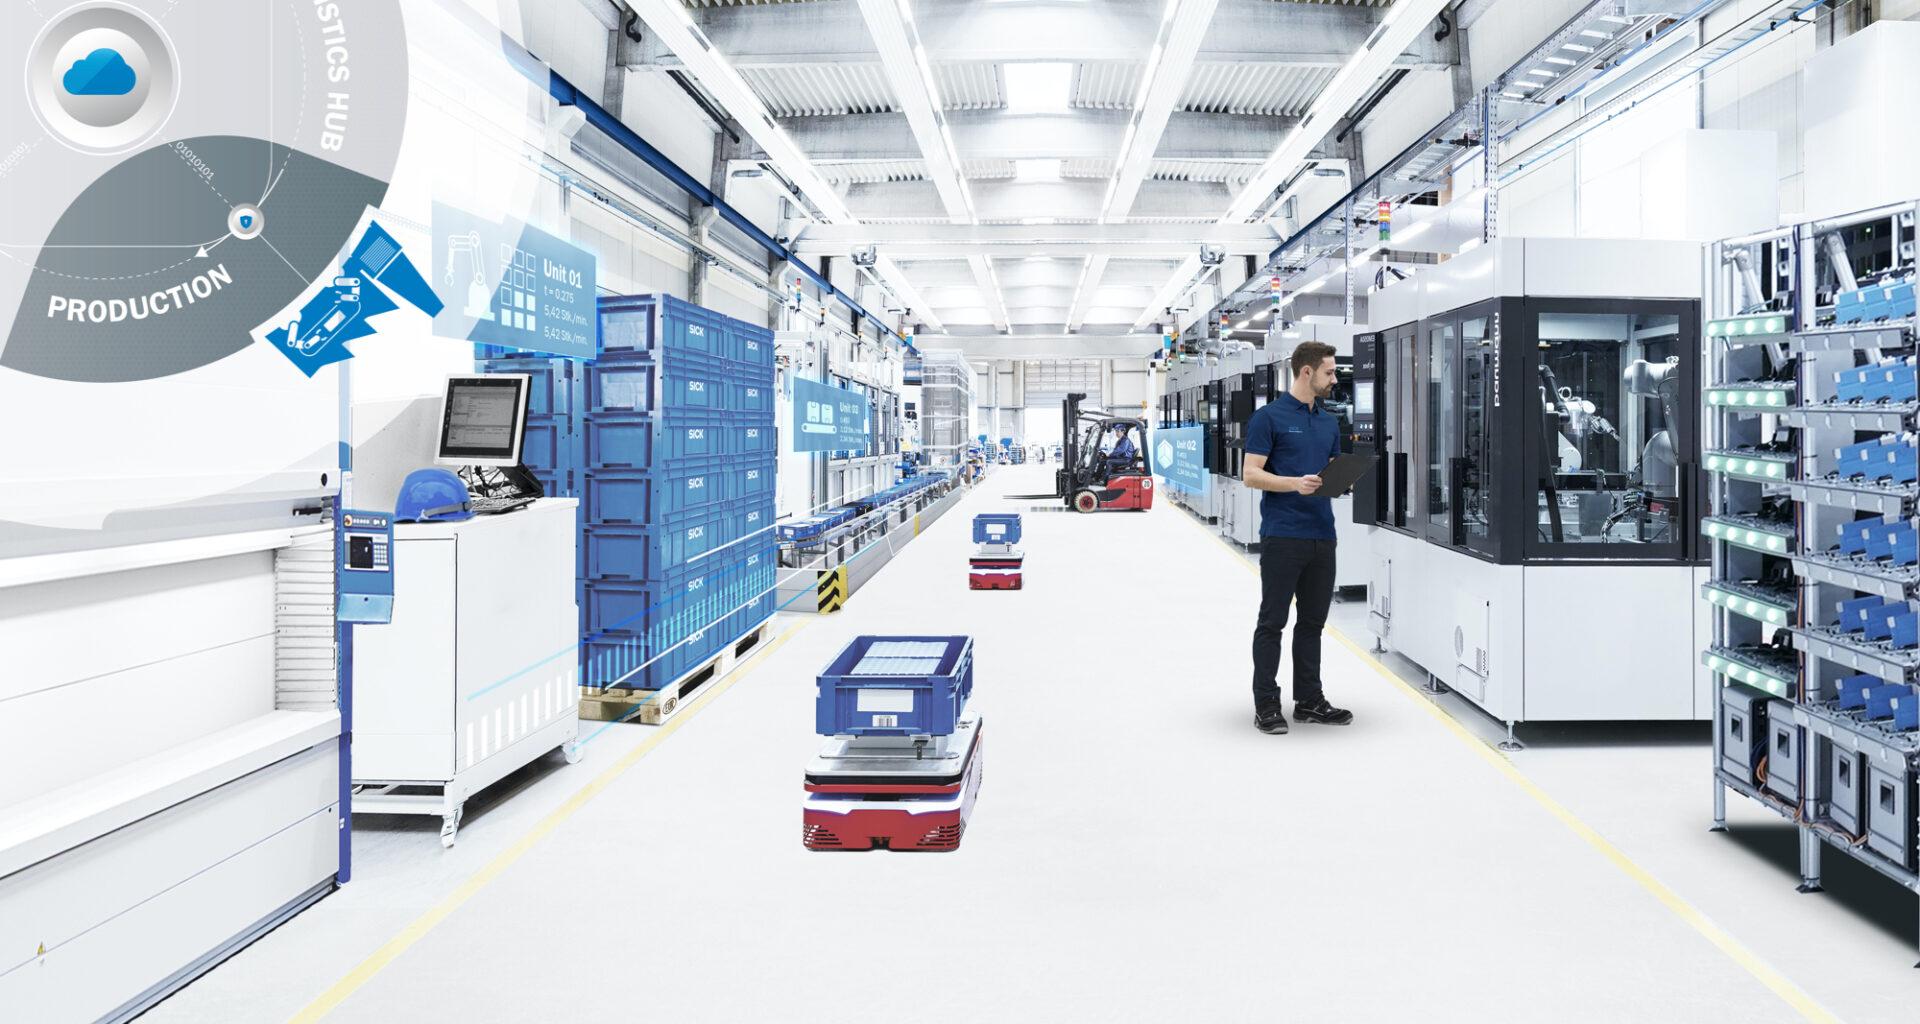 production logistics, Progress toward digitalization in the electronics industry